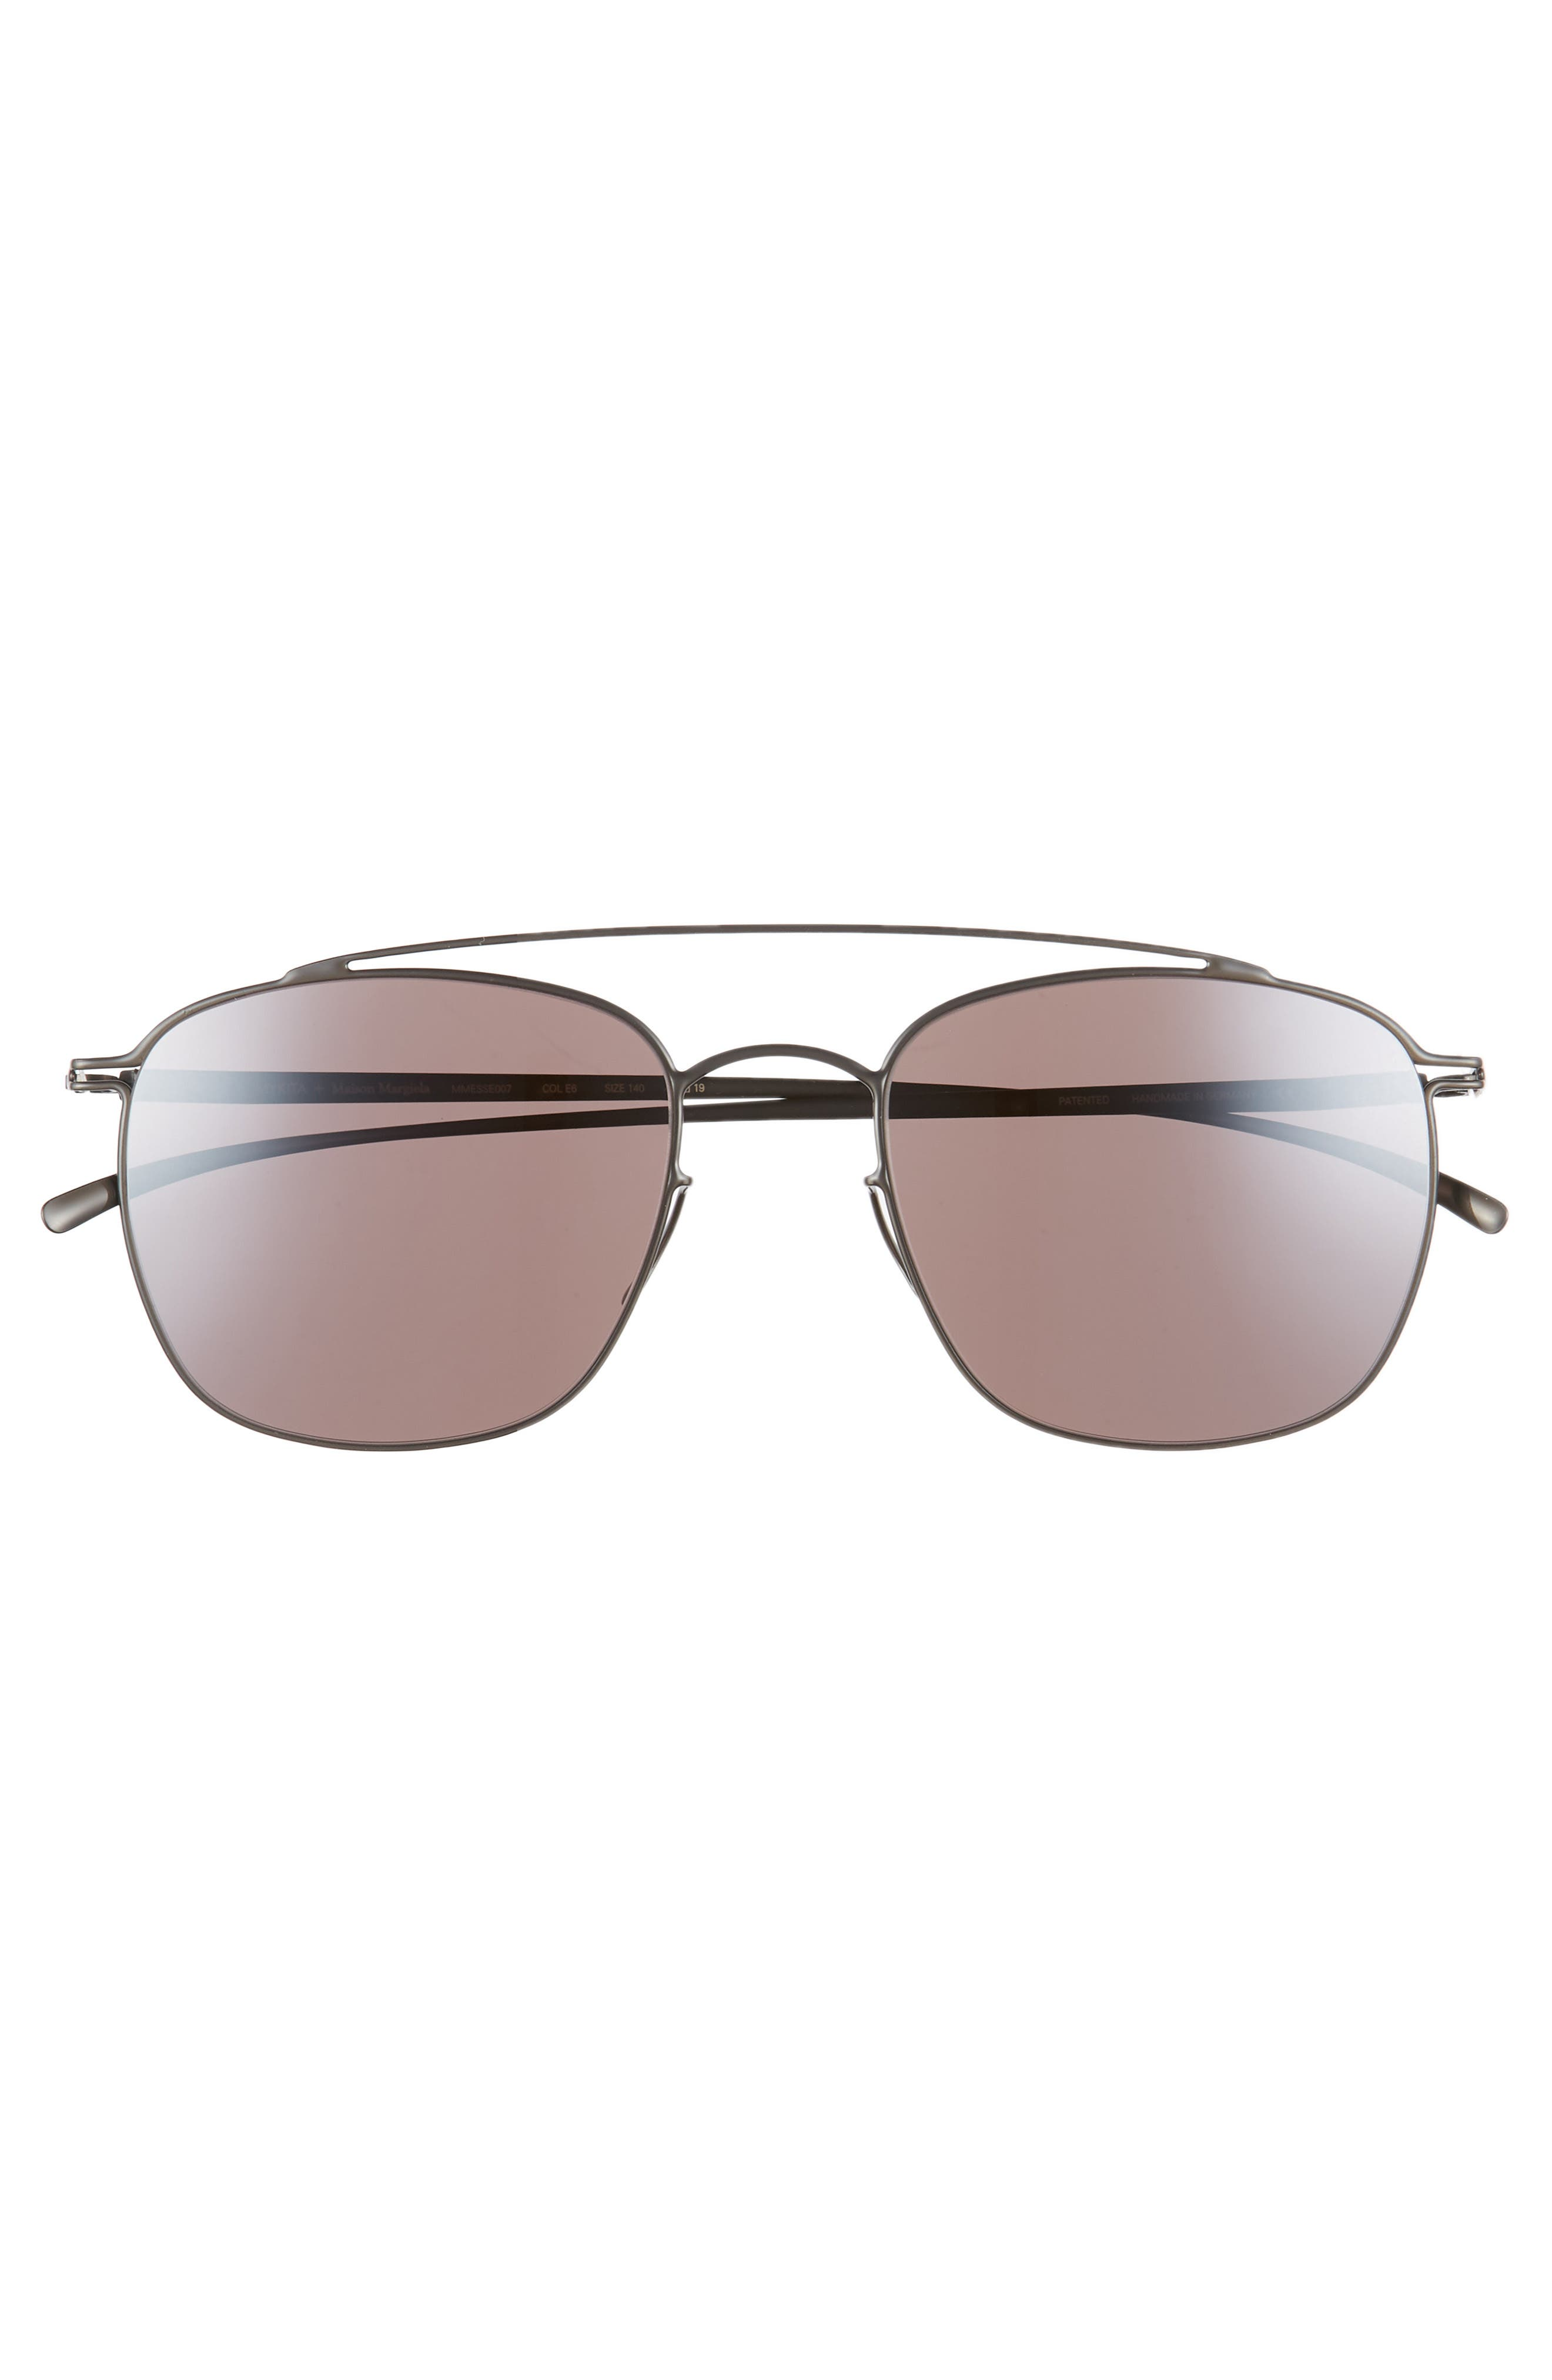 MMESSE007 51mm Aviator Sunglasses,                             Alternate thumbnail 4, color,